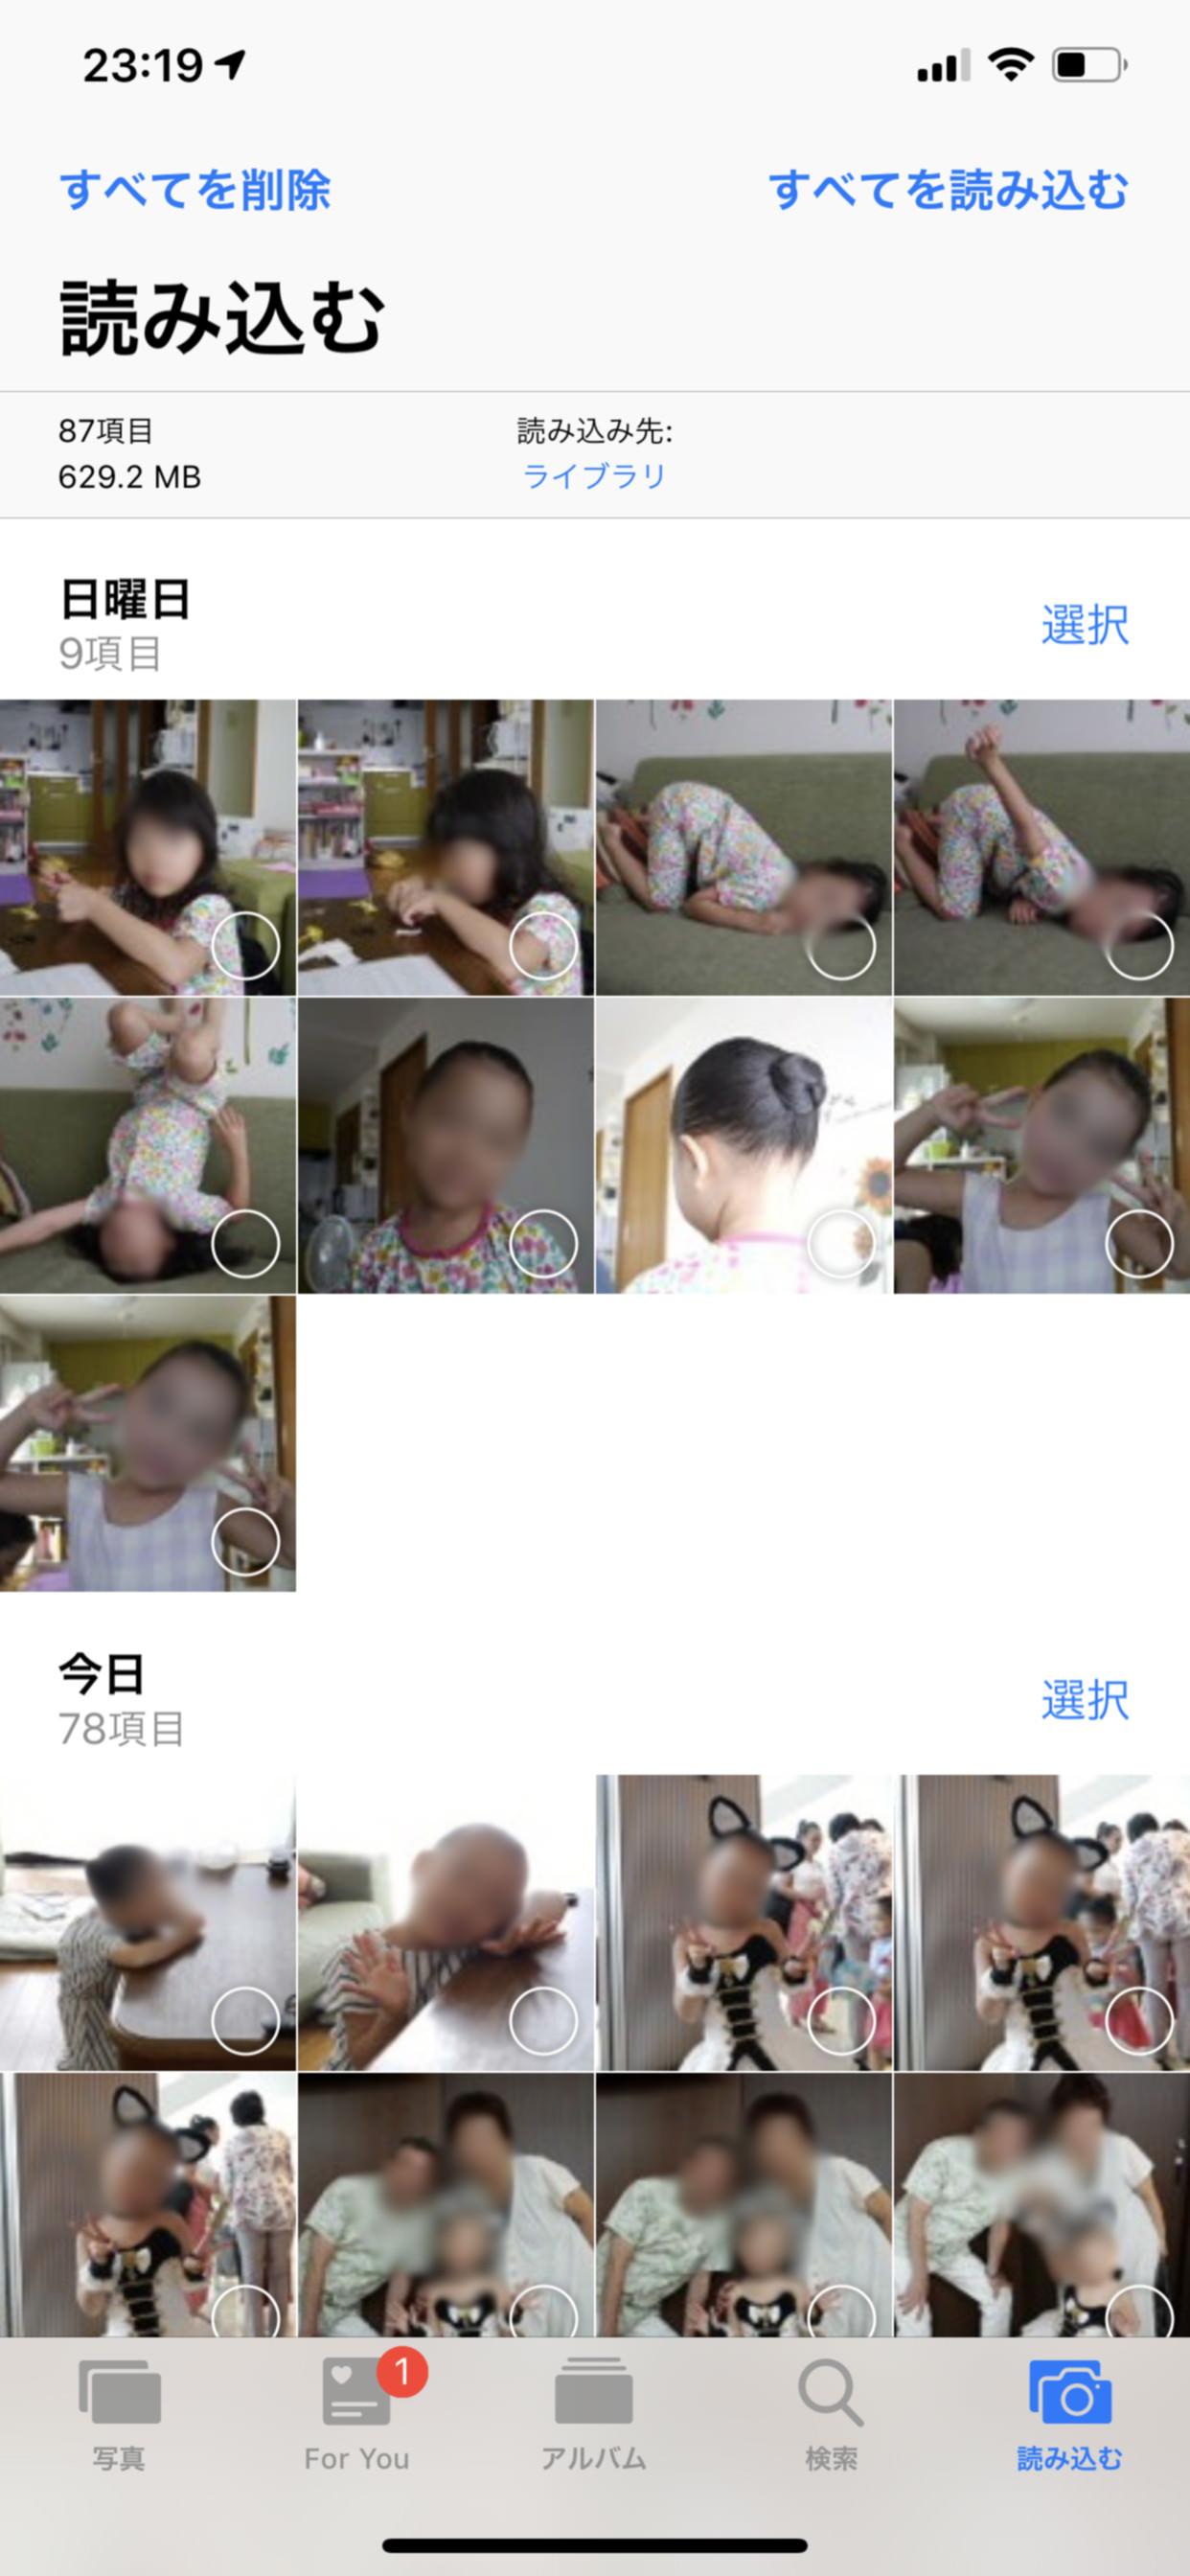 iphone-sdcardreader_4